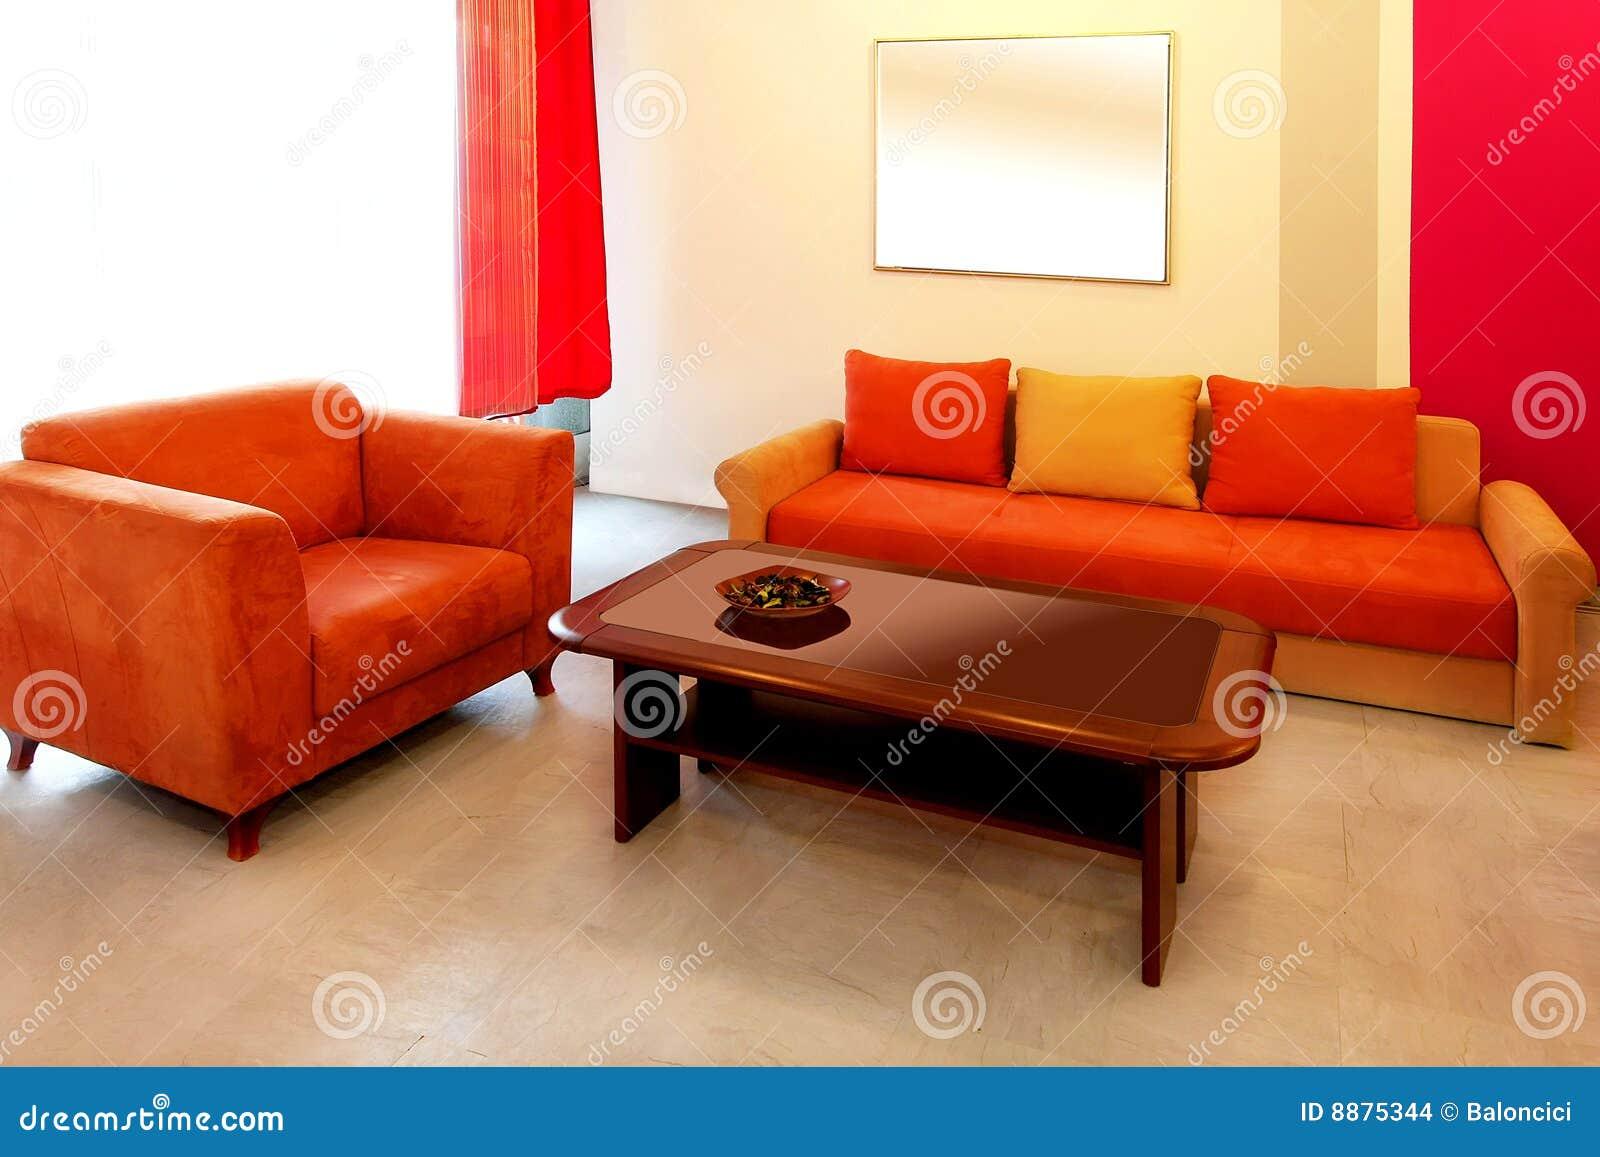 sala de estar roja imagenes de archivo imagen 8875344